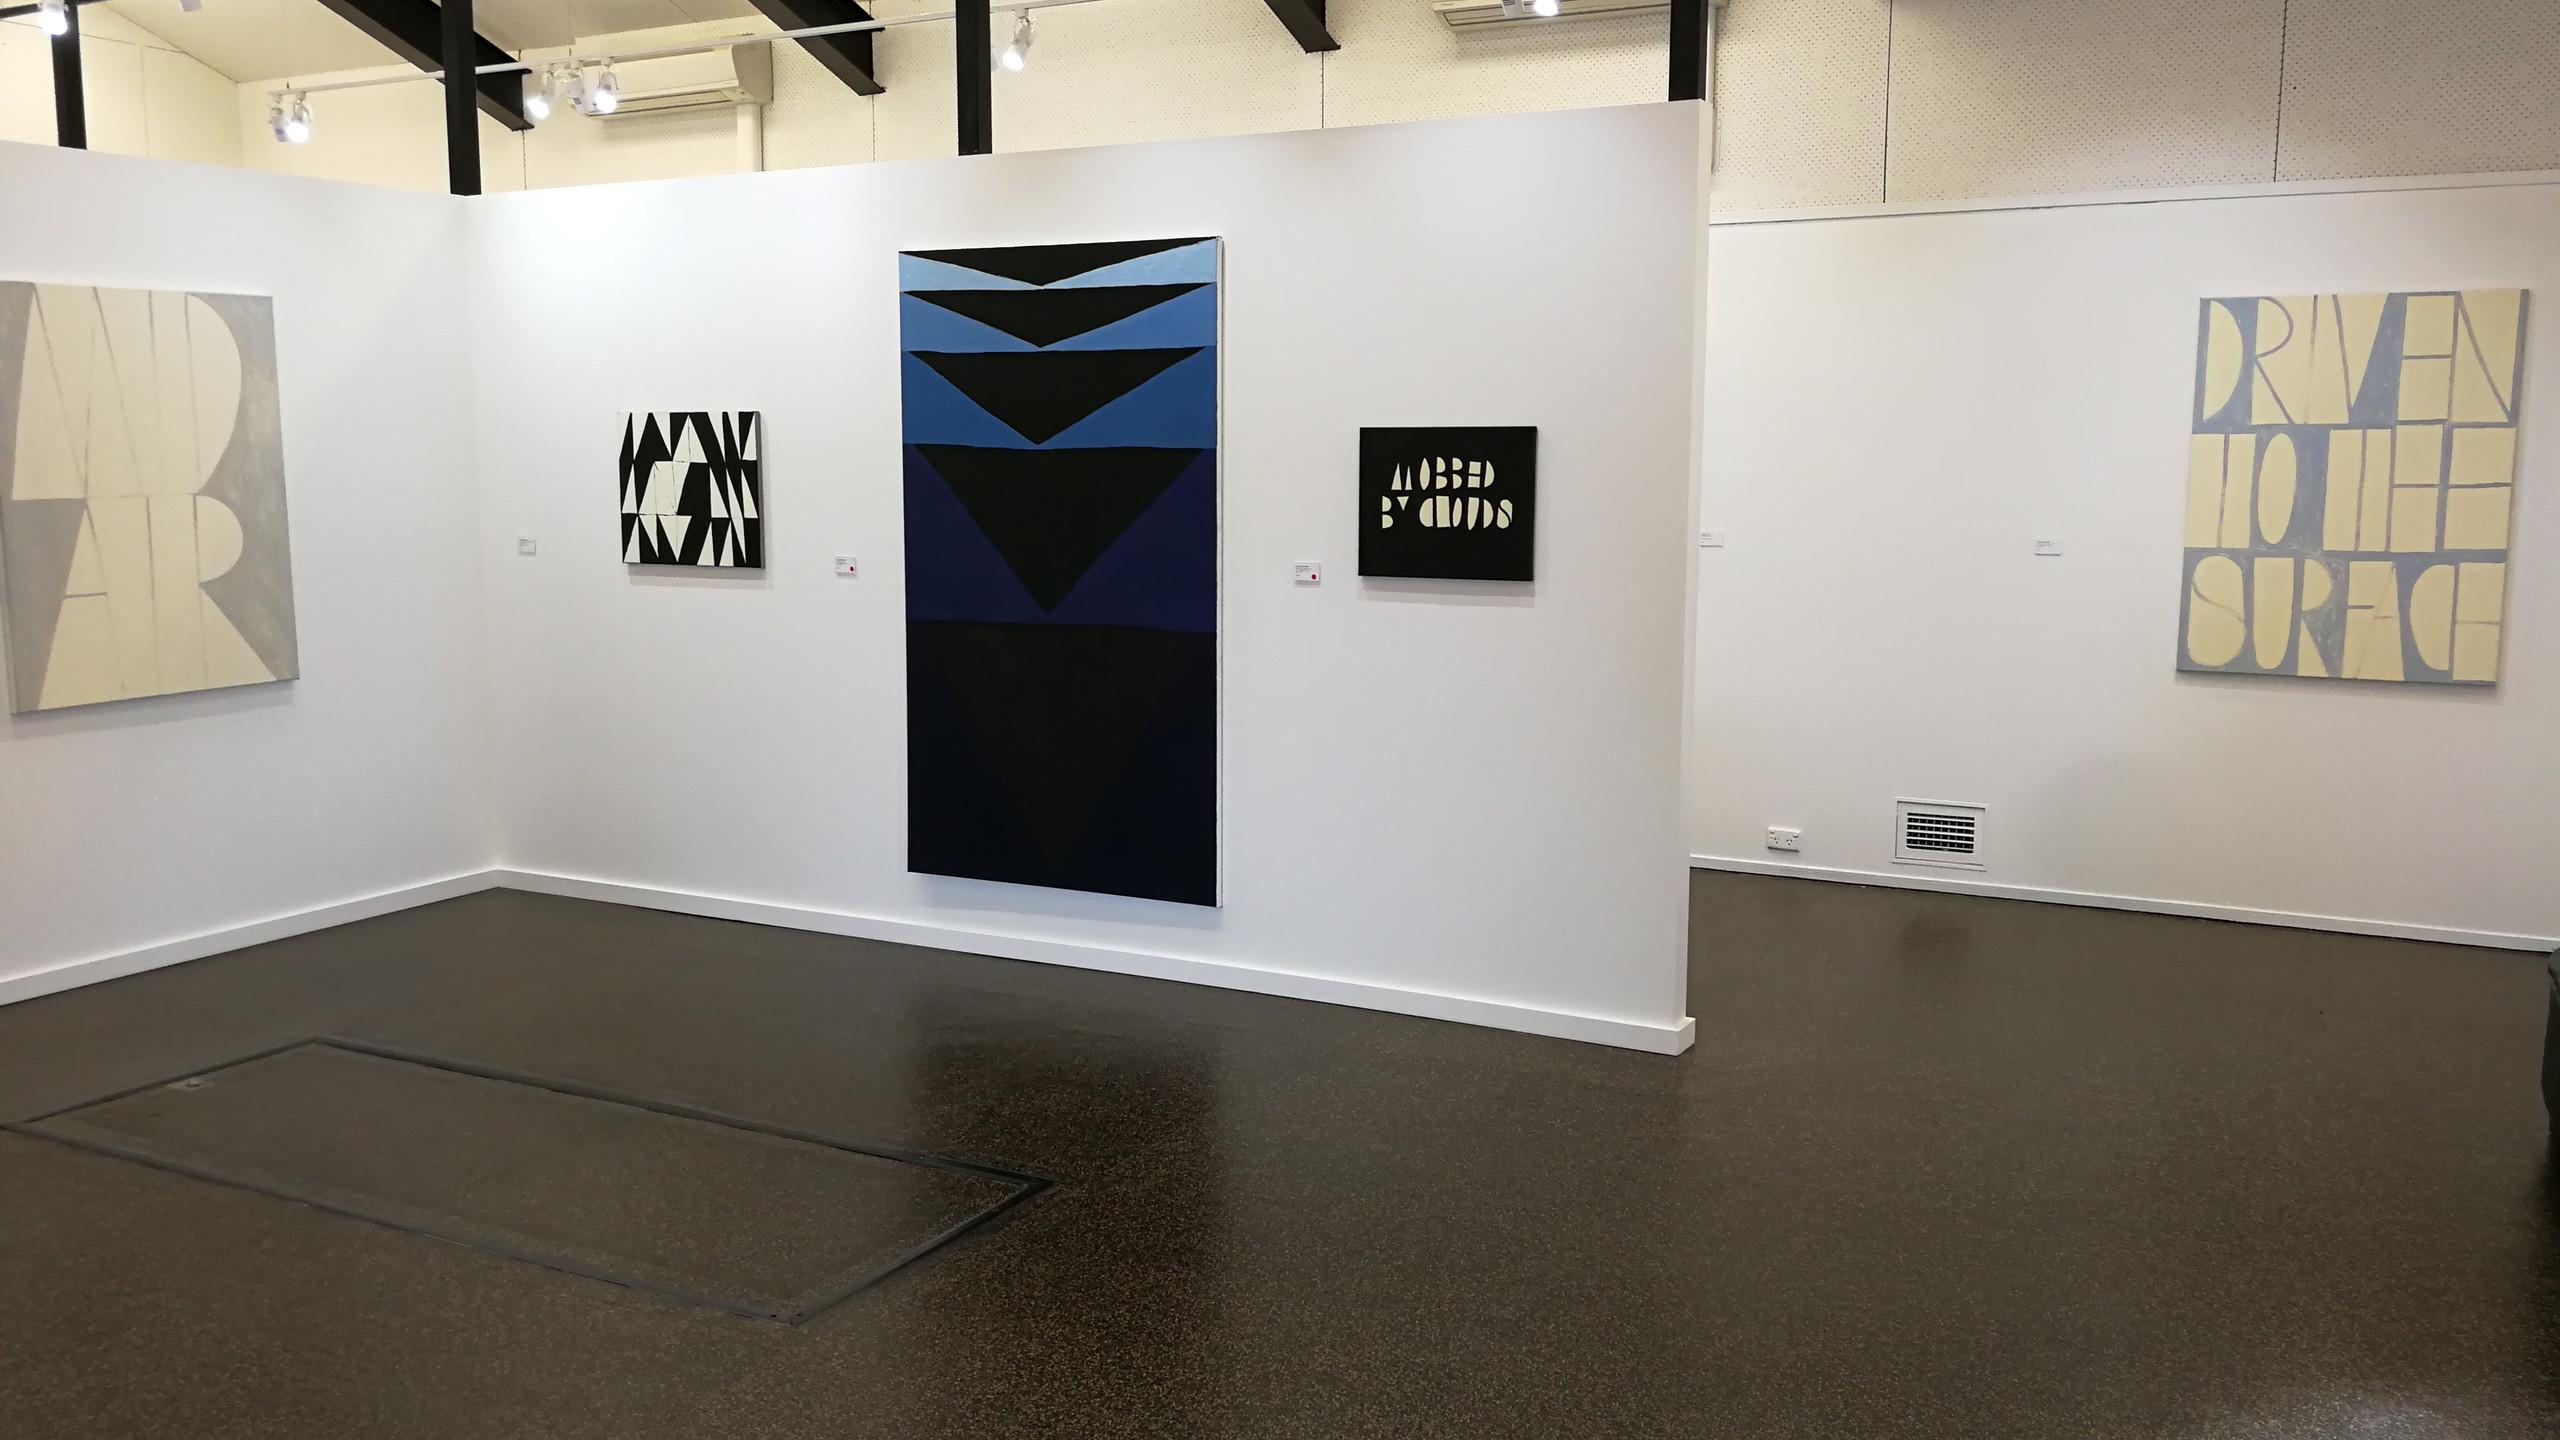 nancy sever gallery installation